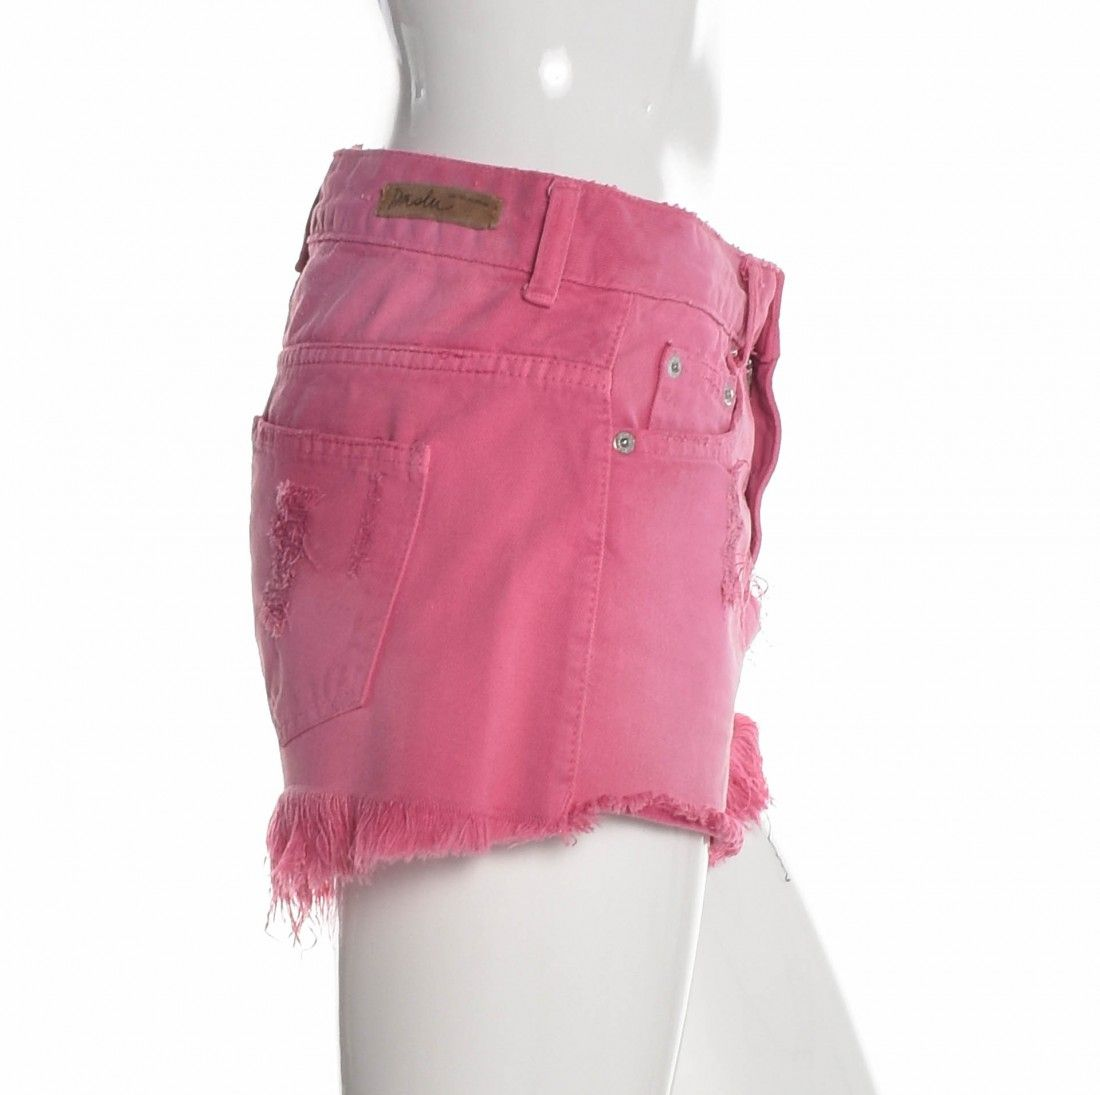 Daslu - Shorts Jeans Rosa - Foto 3